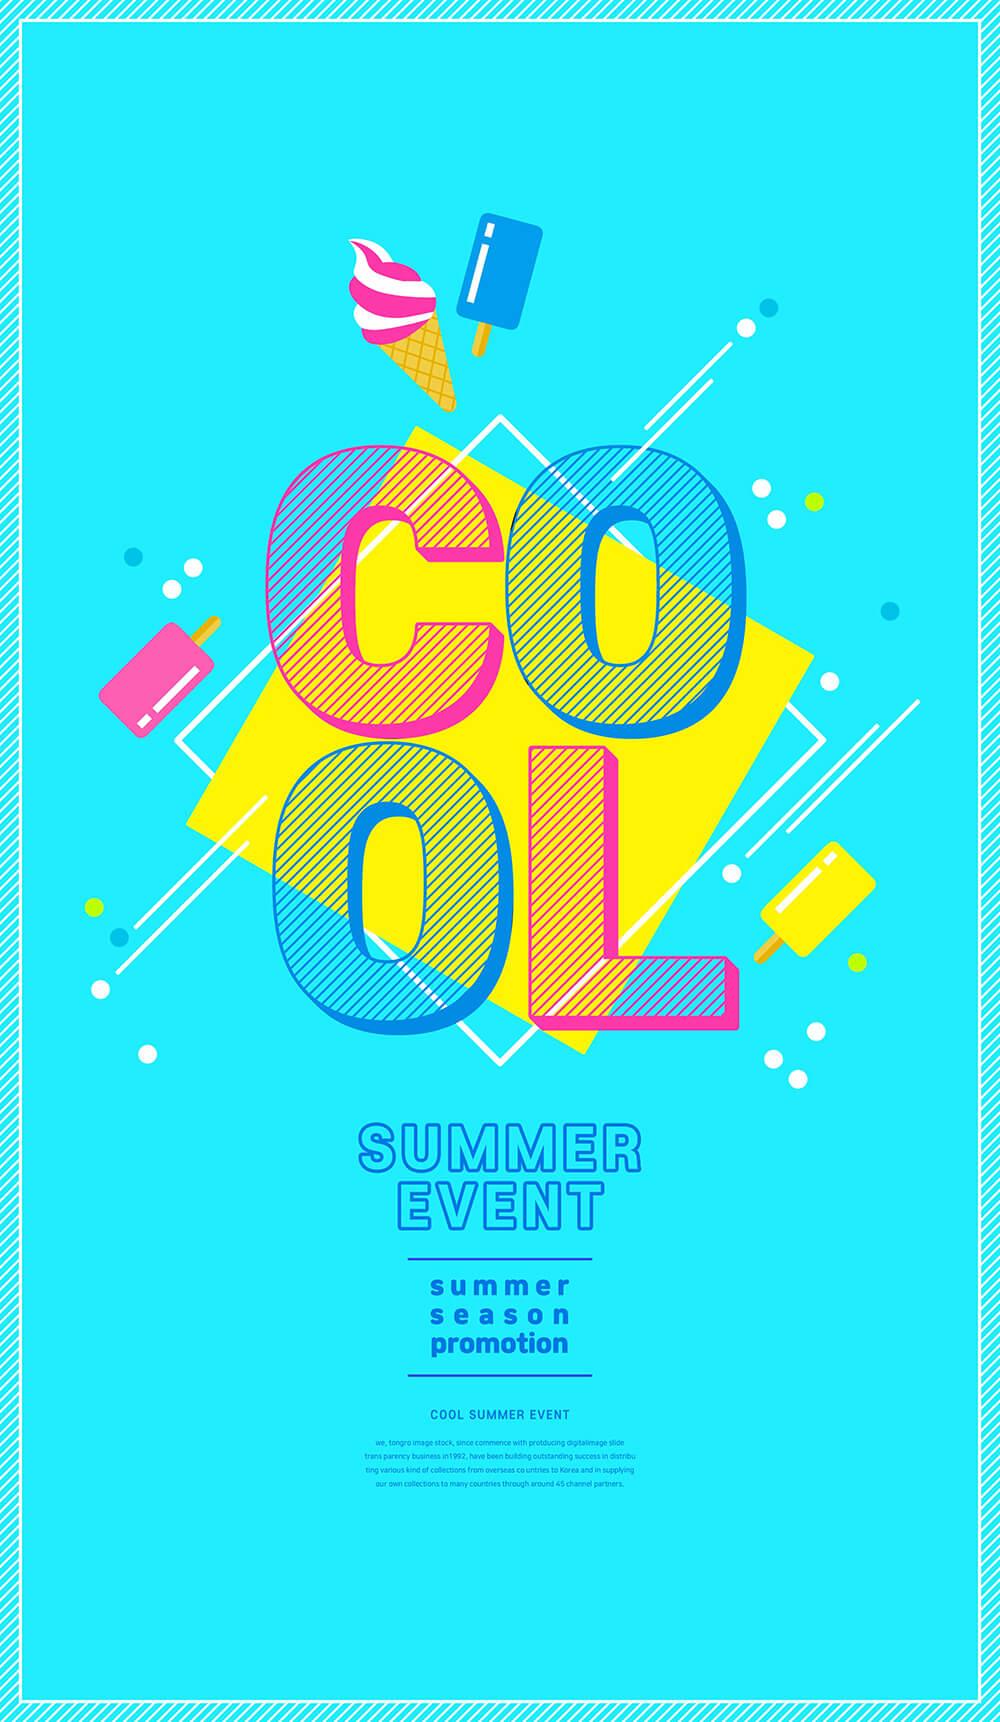 时尚清爽夏季活动宣传海报设计模板designshidai_haibao59